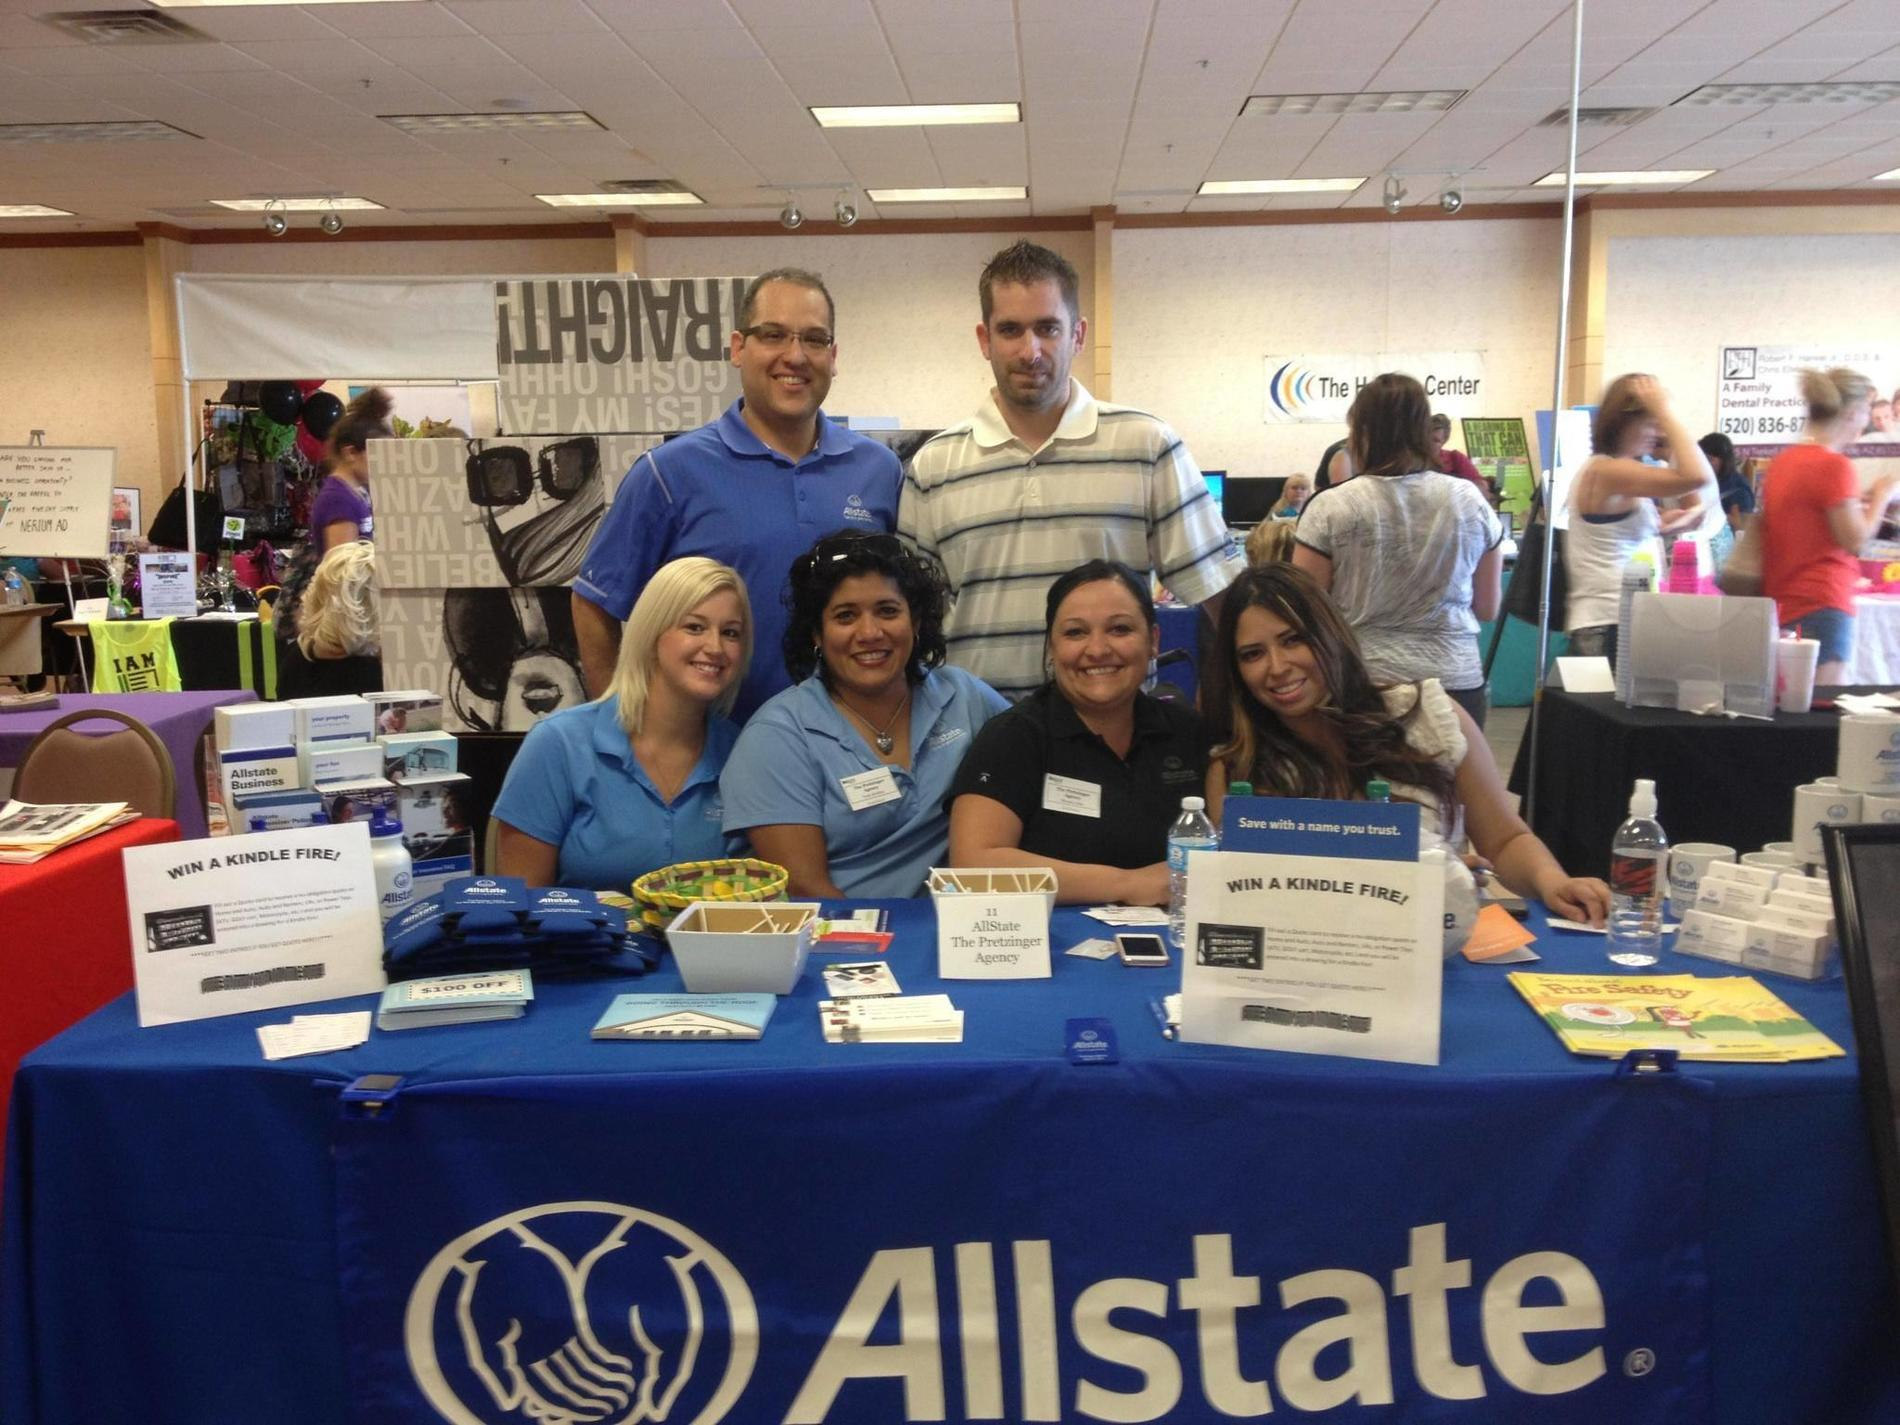 Allstate | Car Insurance in Casa Grande, AZ - Craig Pretzinger